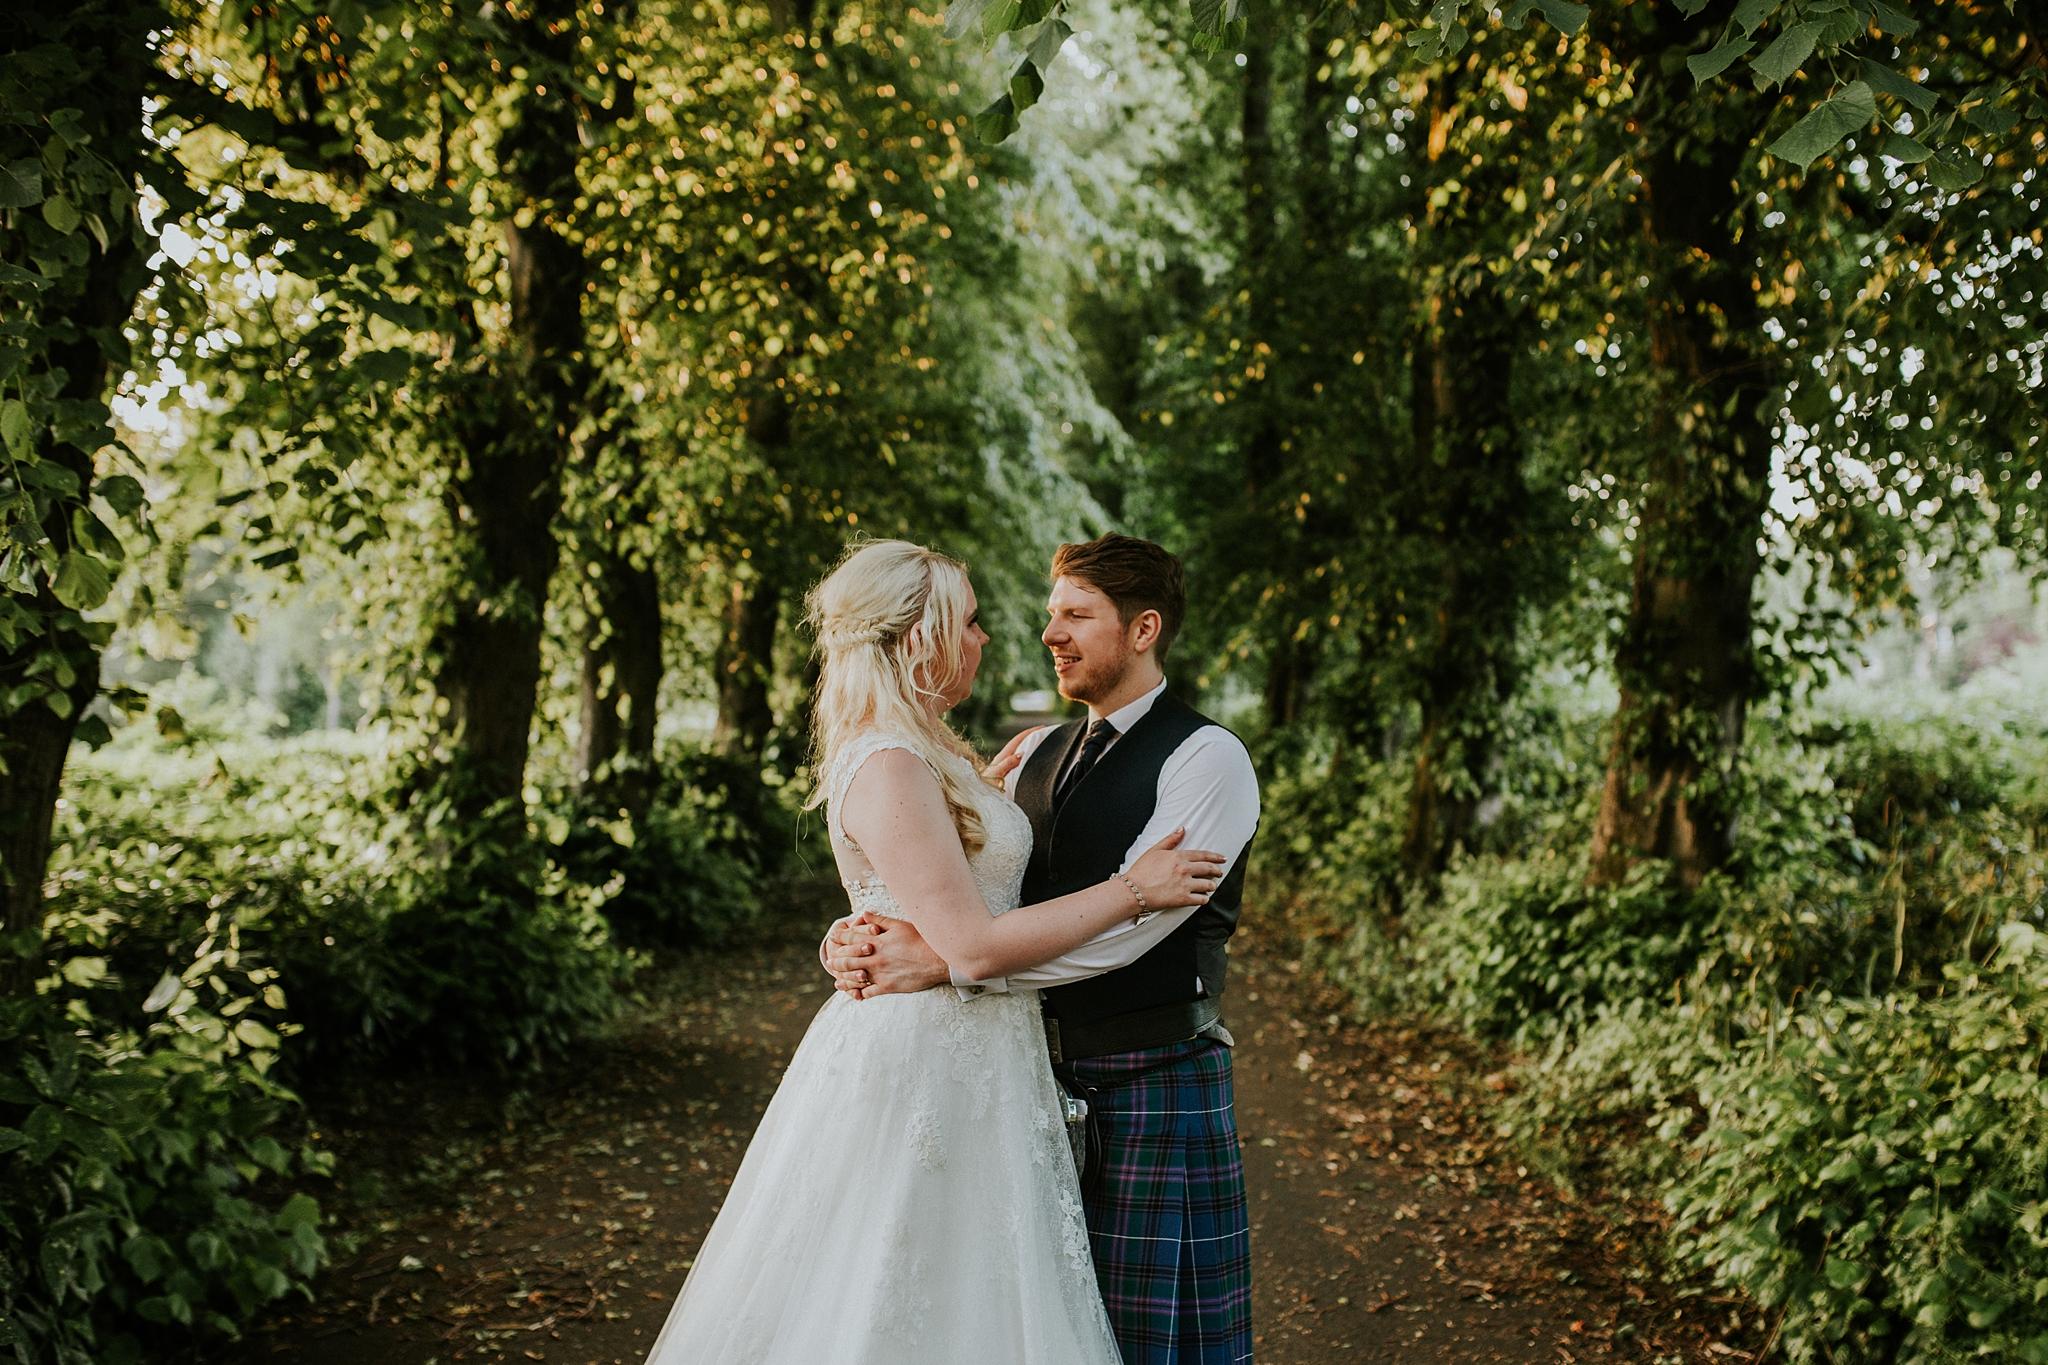 Mark_Alison_Pollockshields_Burgh_Hall_Wedding-45.JPG